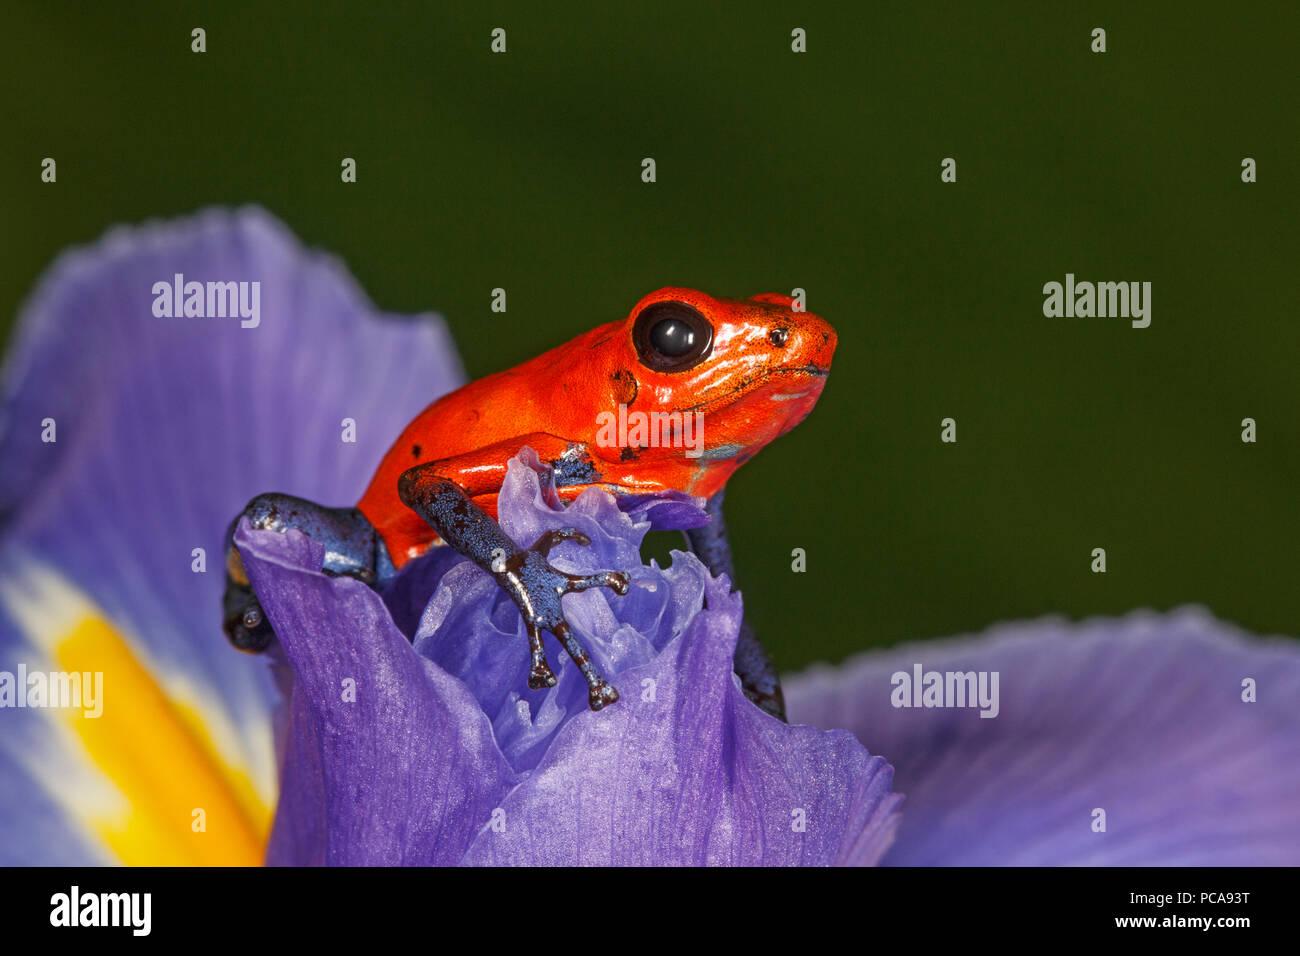 Nicaragua blue jean dart frog or Pumilio dart frog (Oophaga pumilio) on an iris - Stock Image